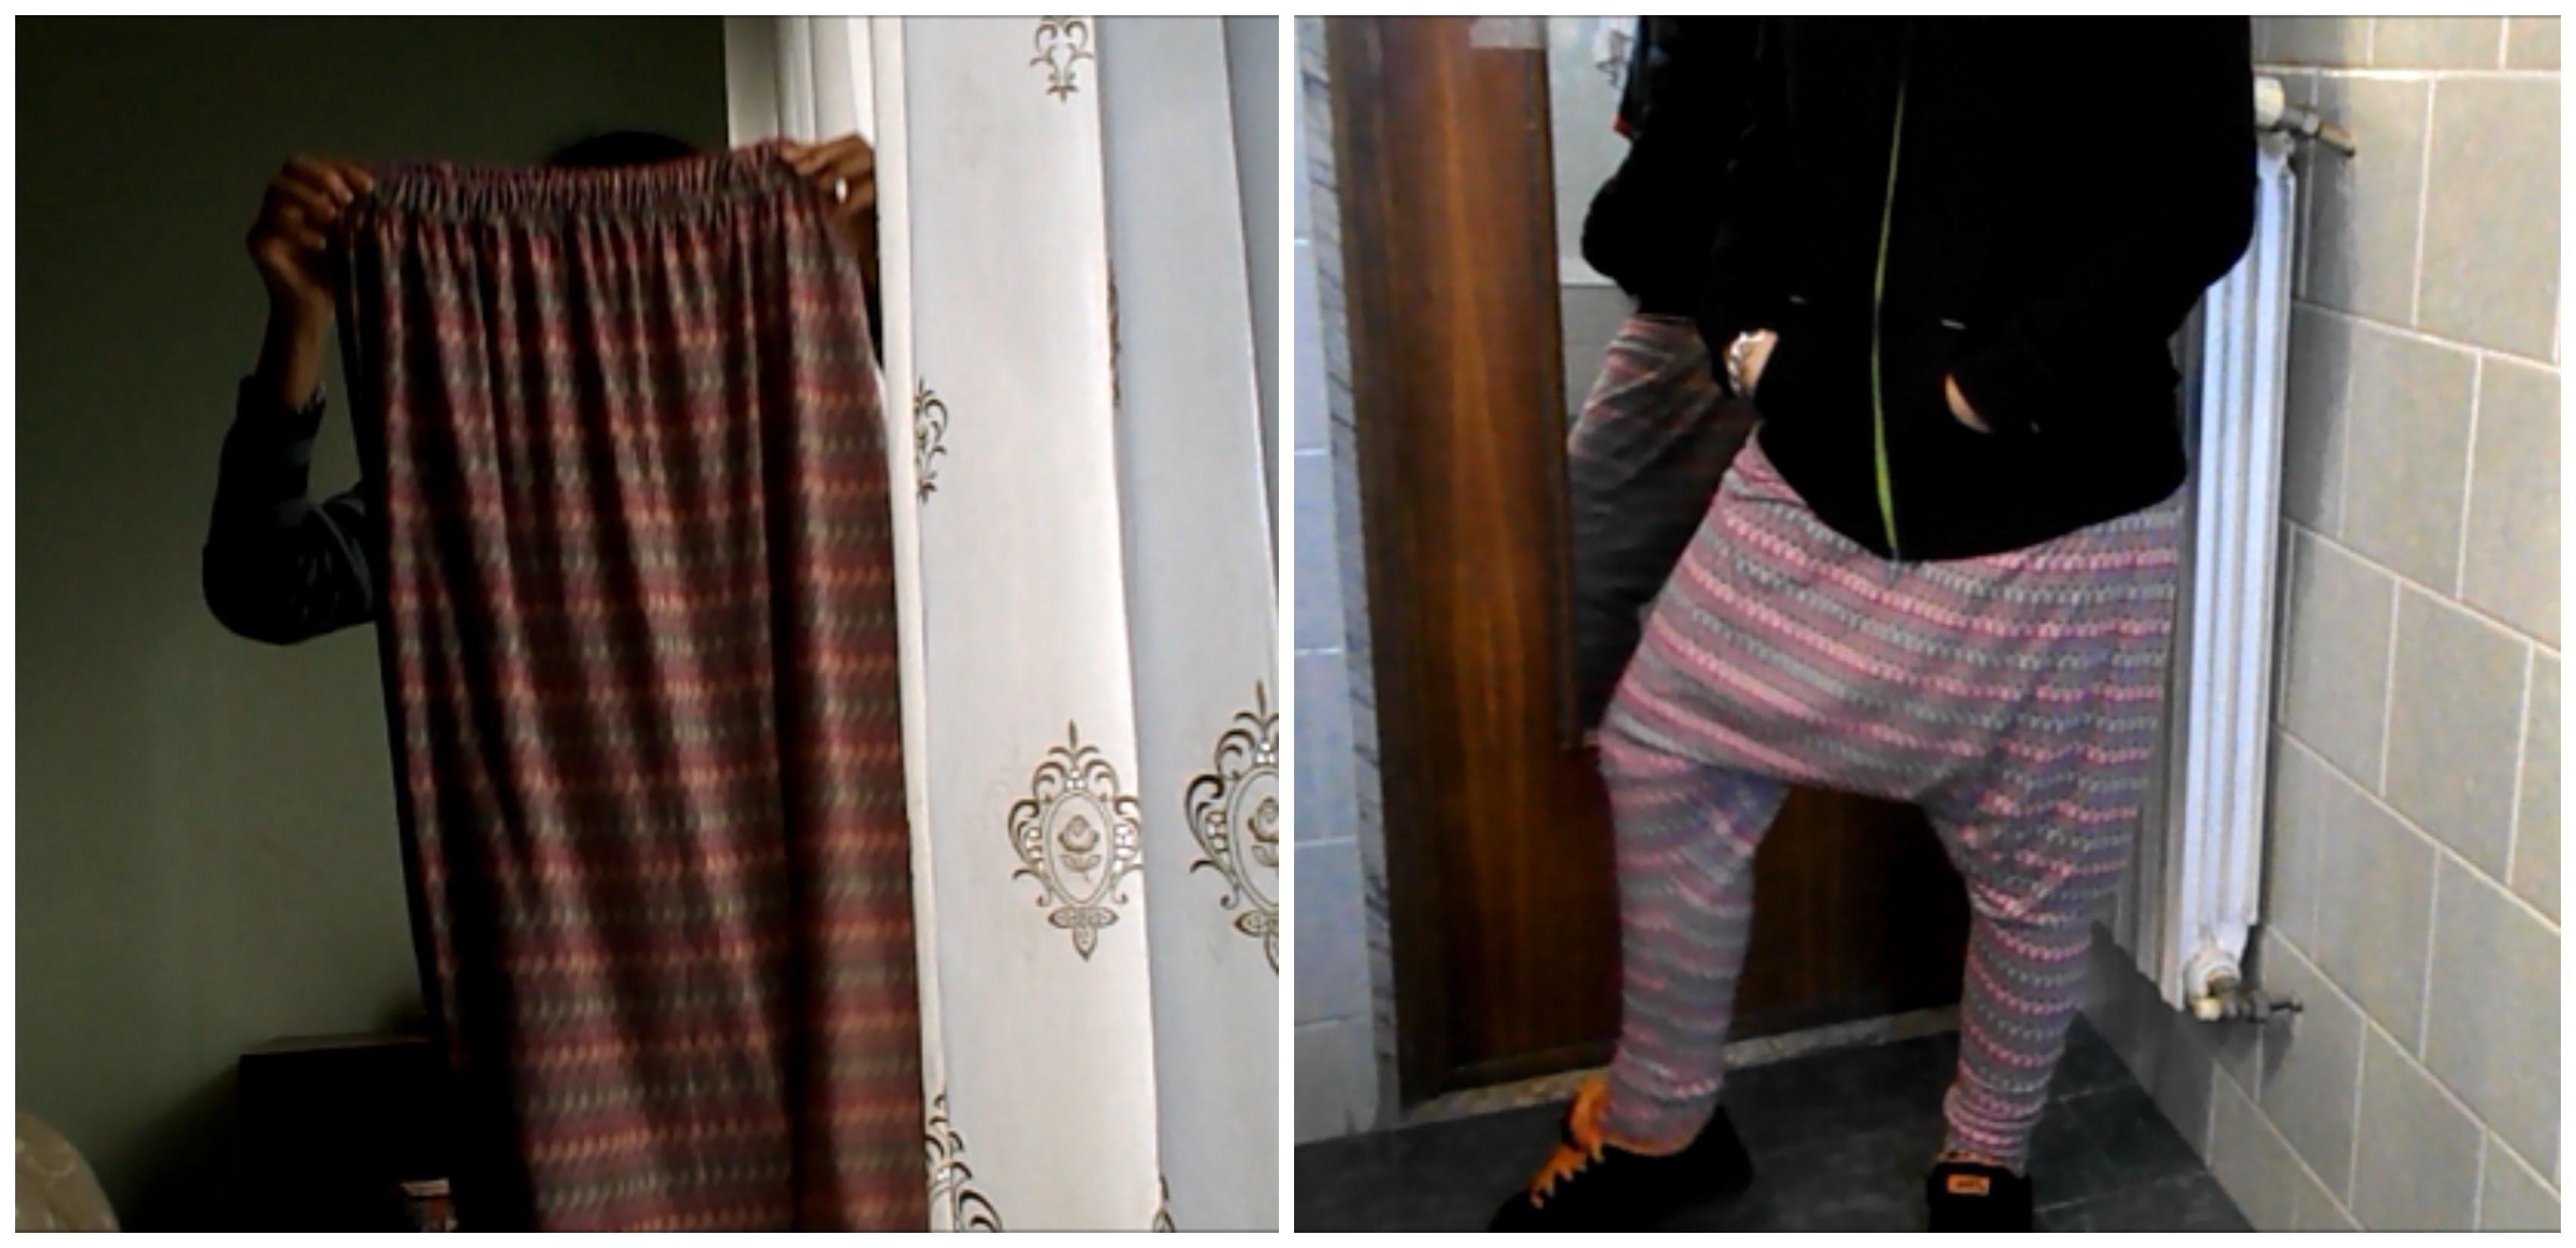 DIY TUTORIAL - Turn your skirt in a harem pants! Trasforma la tua gonna in un pantalone harem!